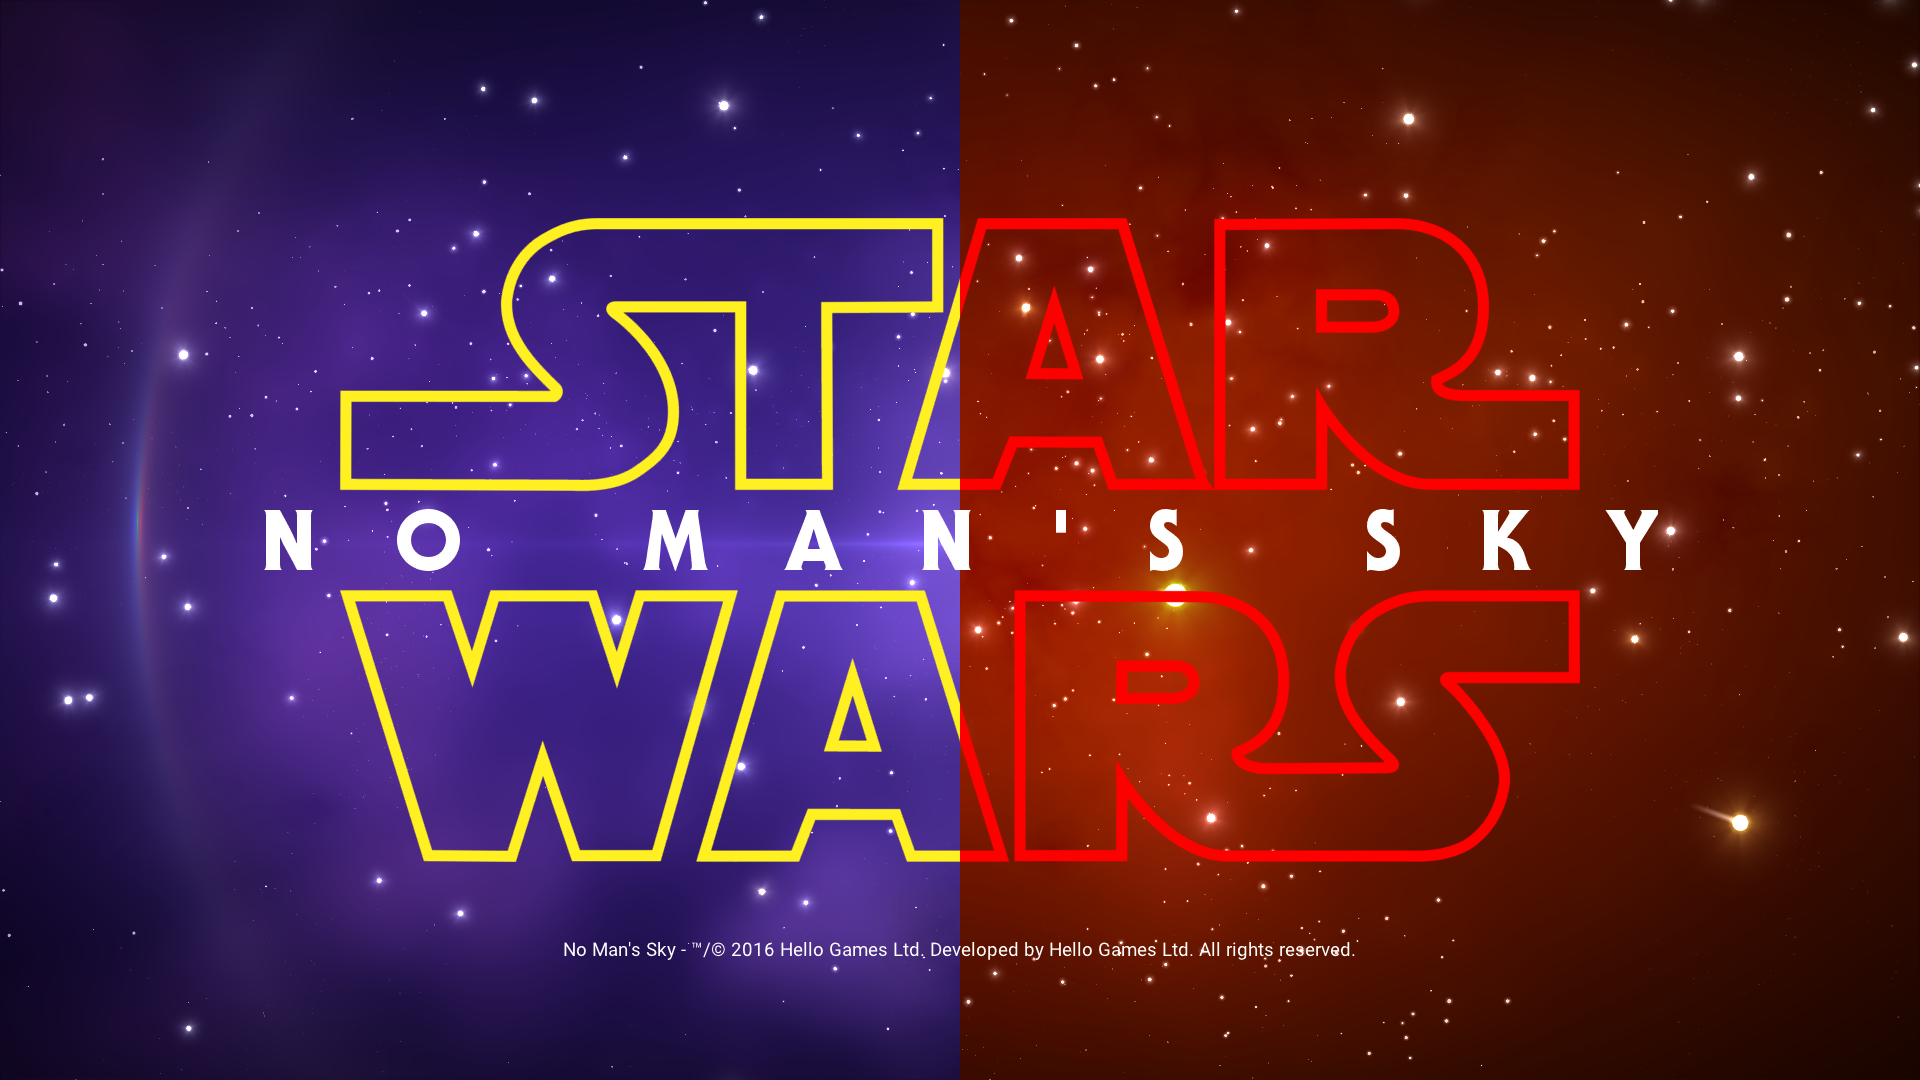 Star Wars Intro Logo